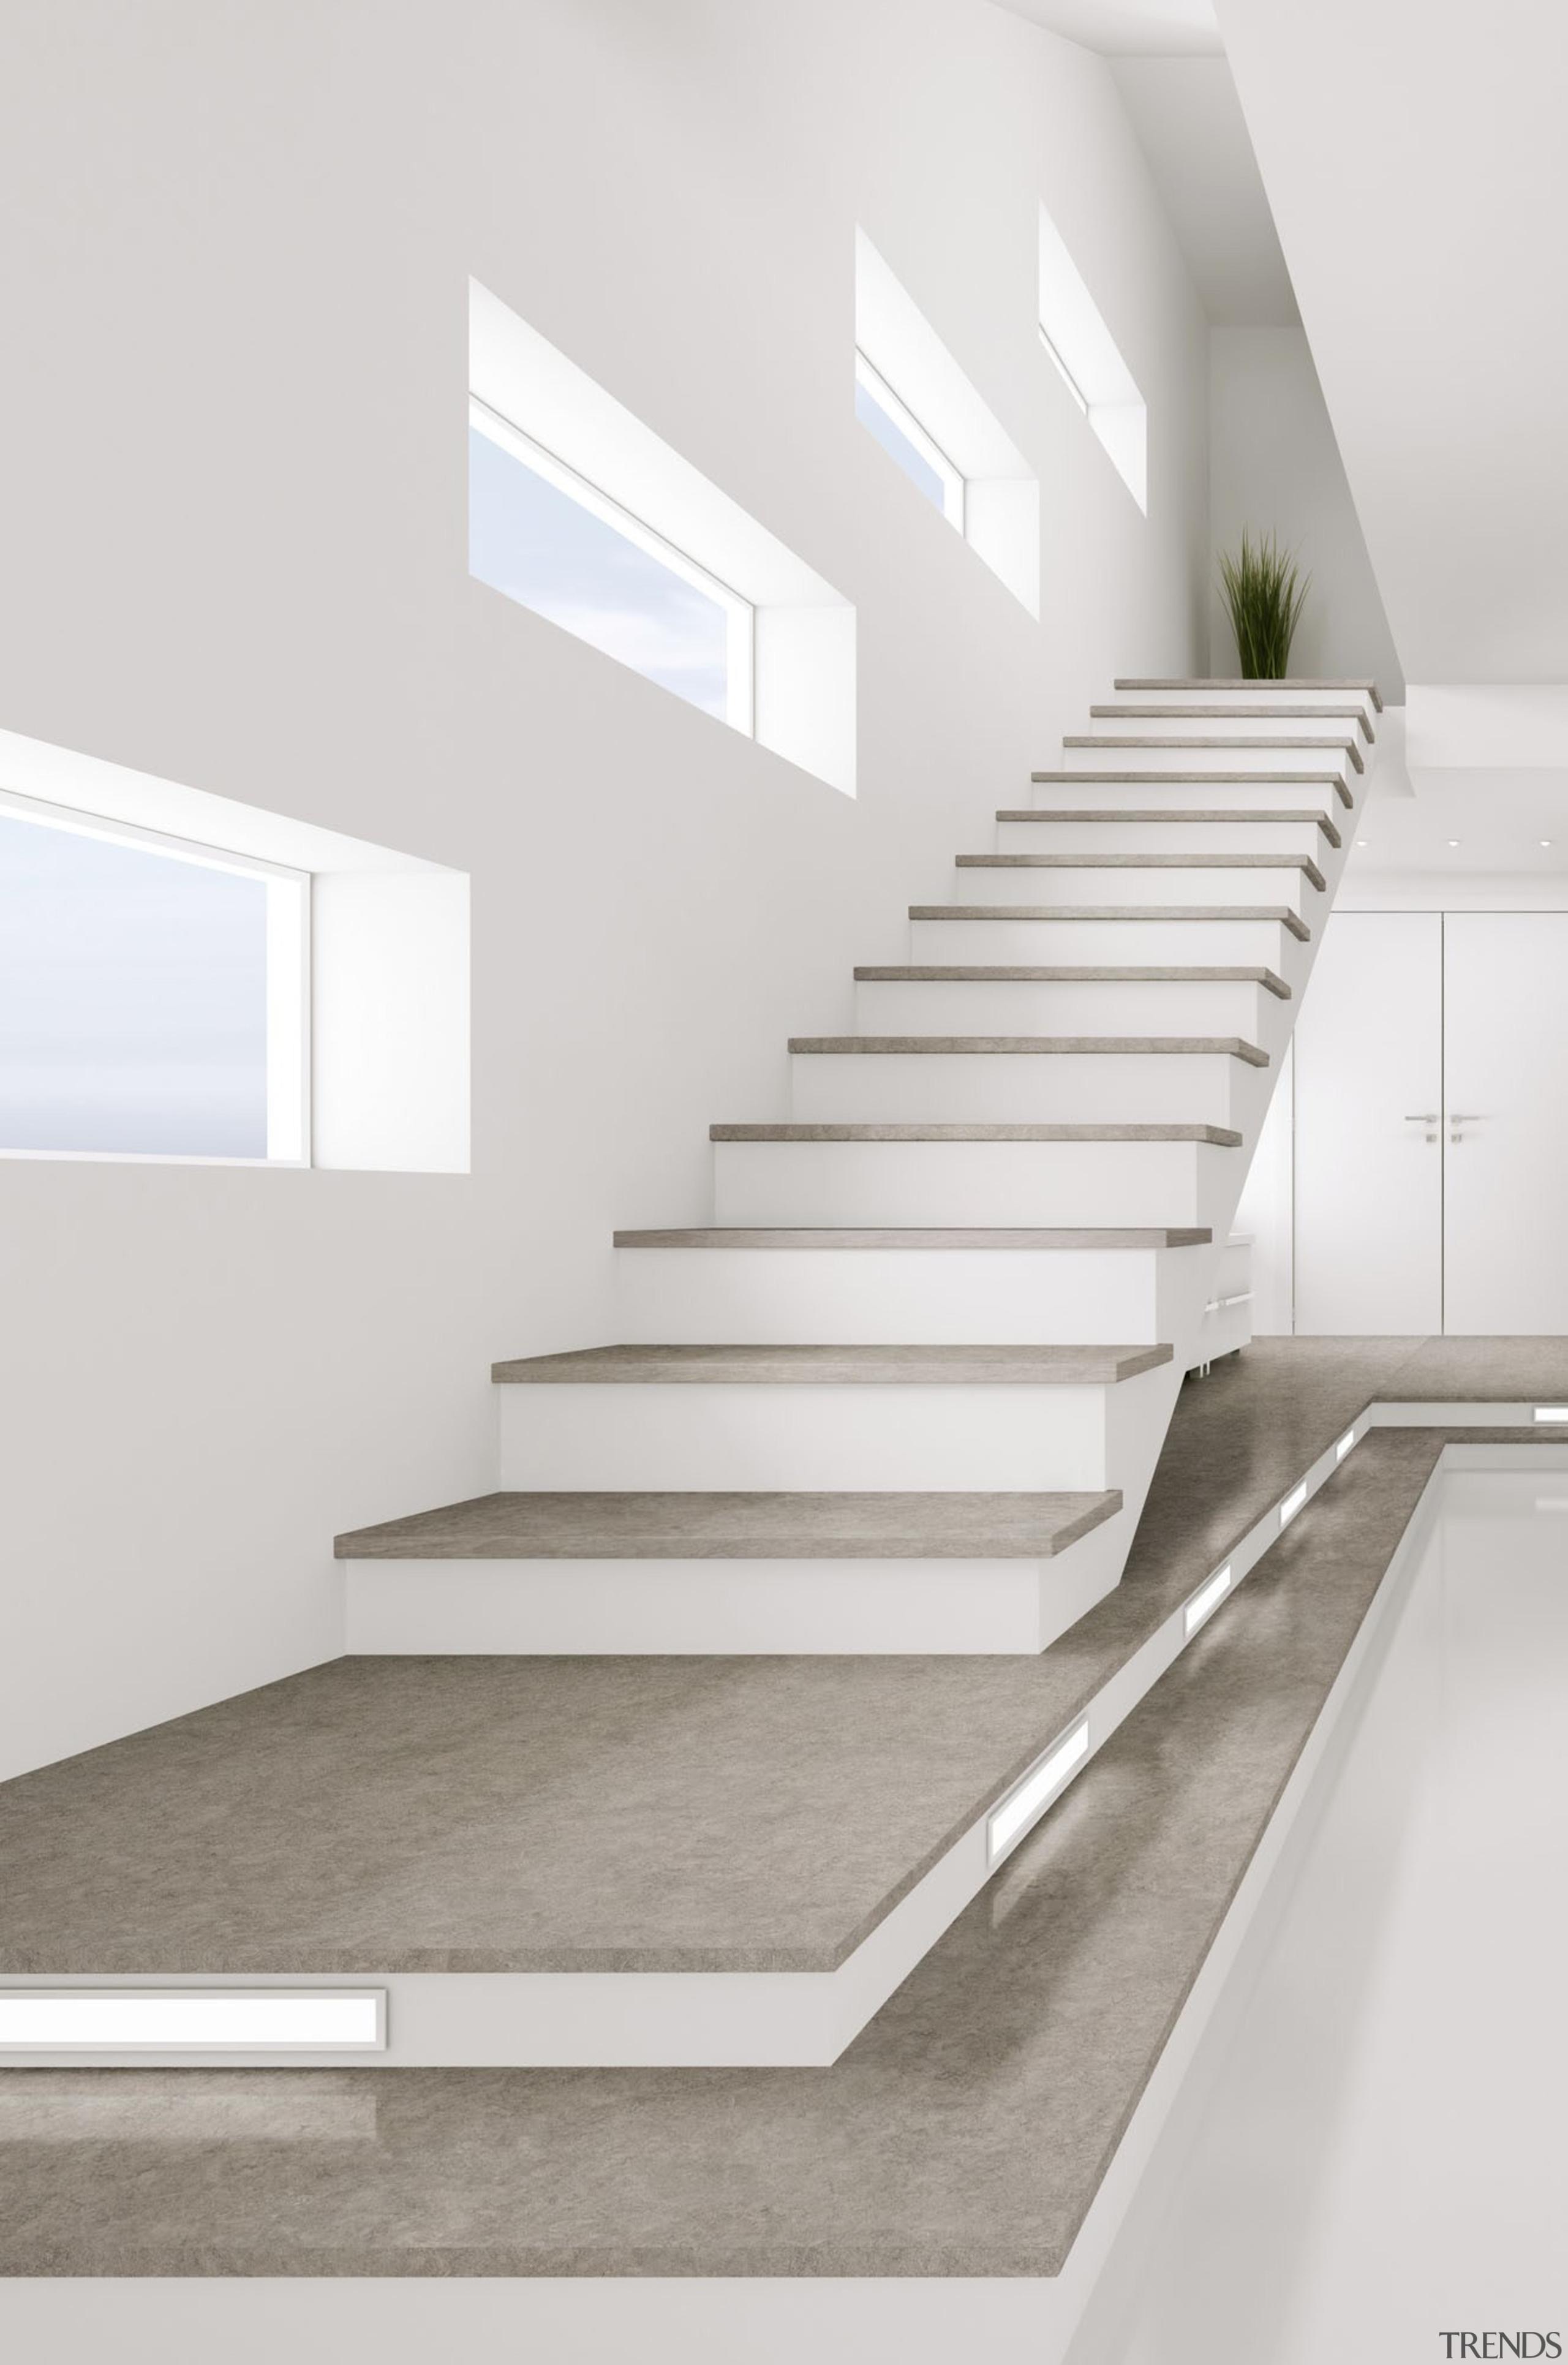 VEGHA Escaleras - VEGHA Escaleras - angle   angle, architecture, daylighting, handrail, interior design, product design, stairs, white